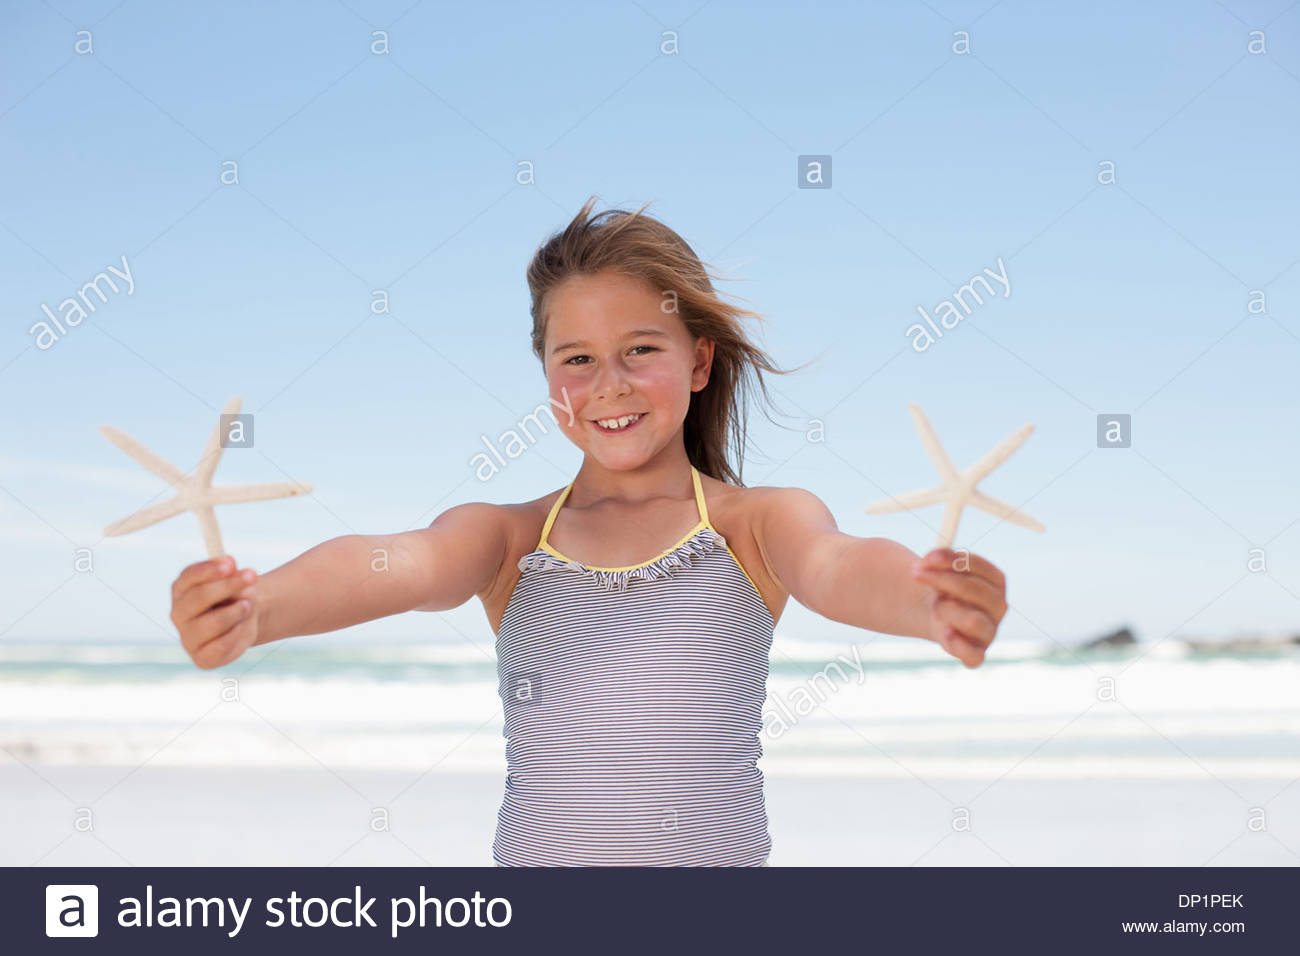 Chica sujetando starfish en la playa Imagen De Stock